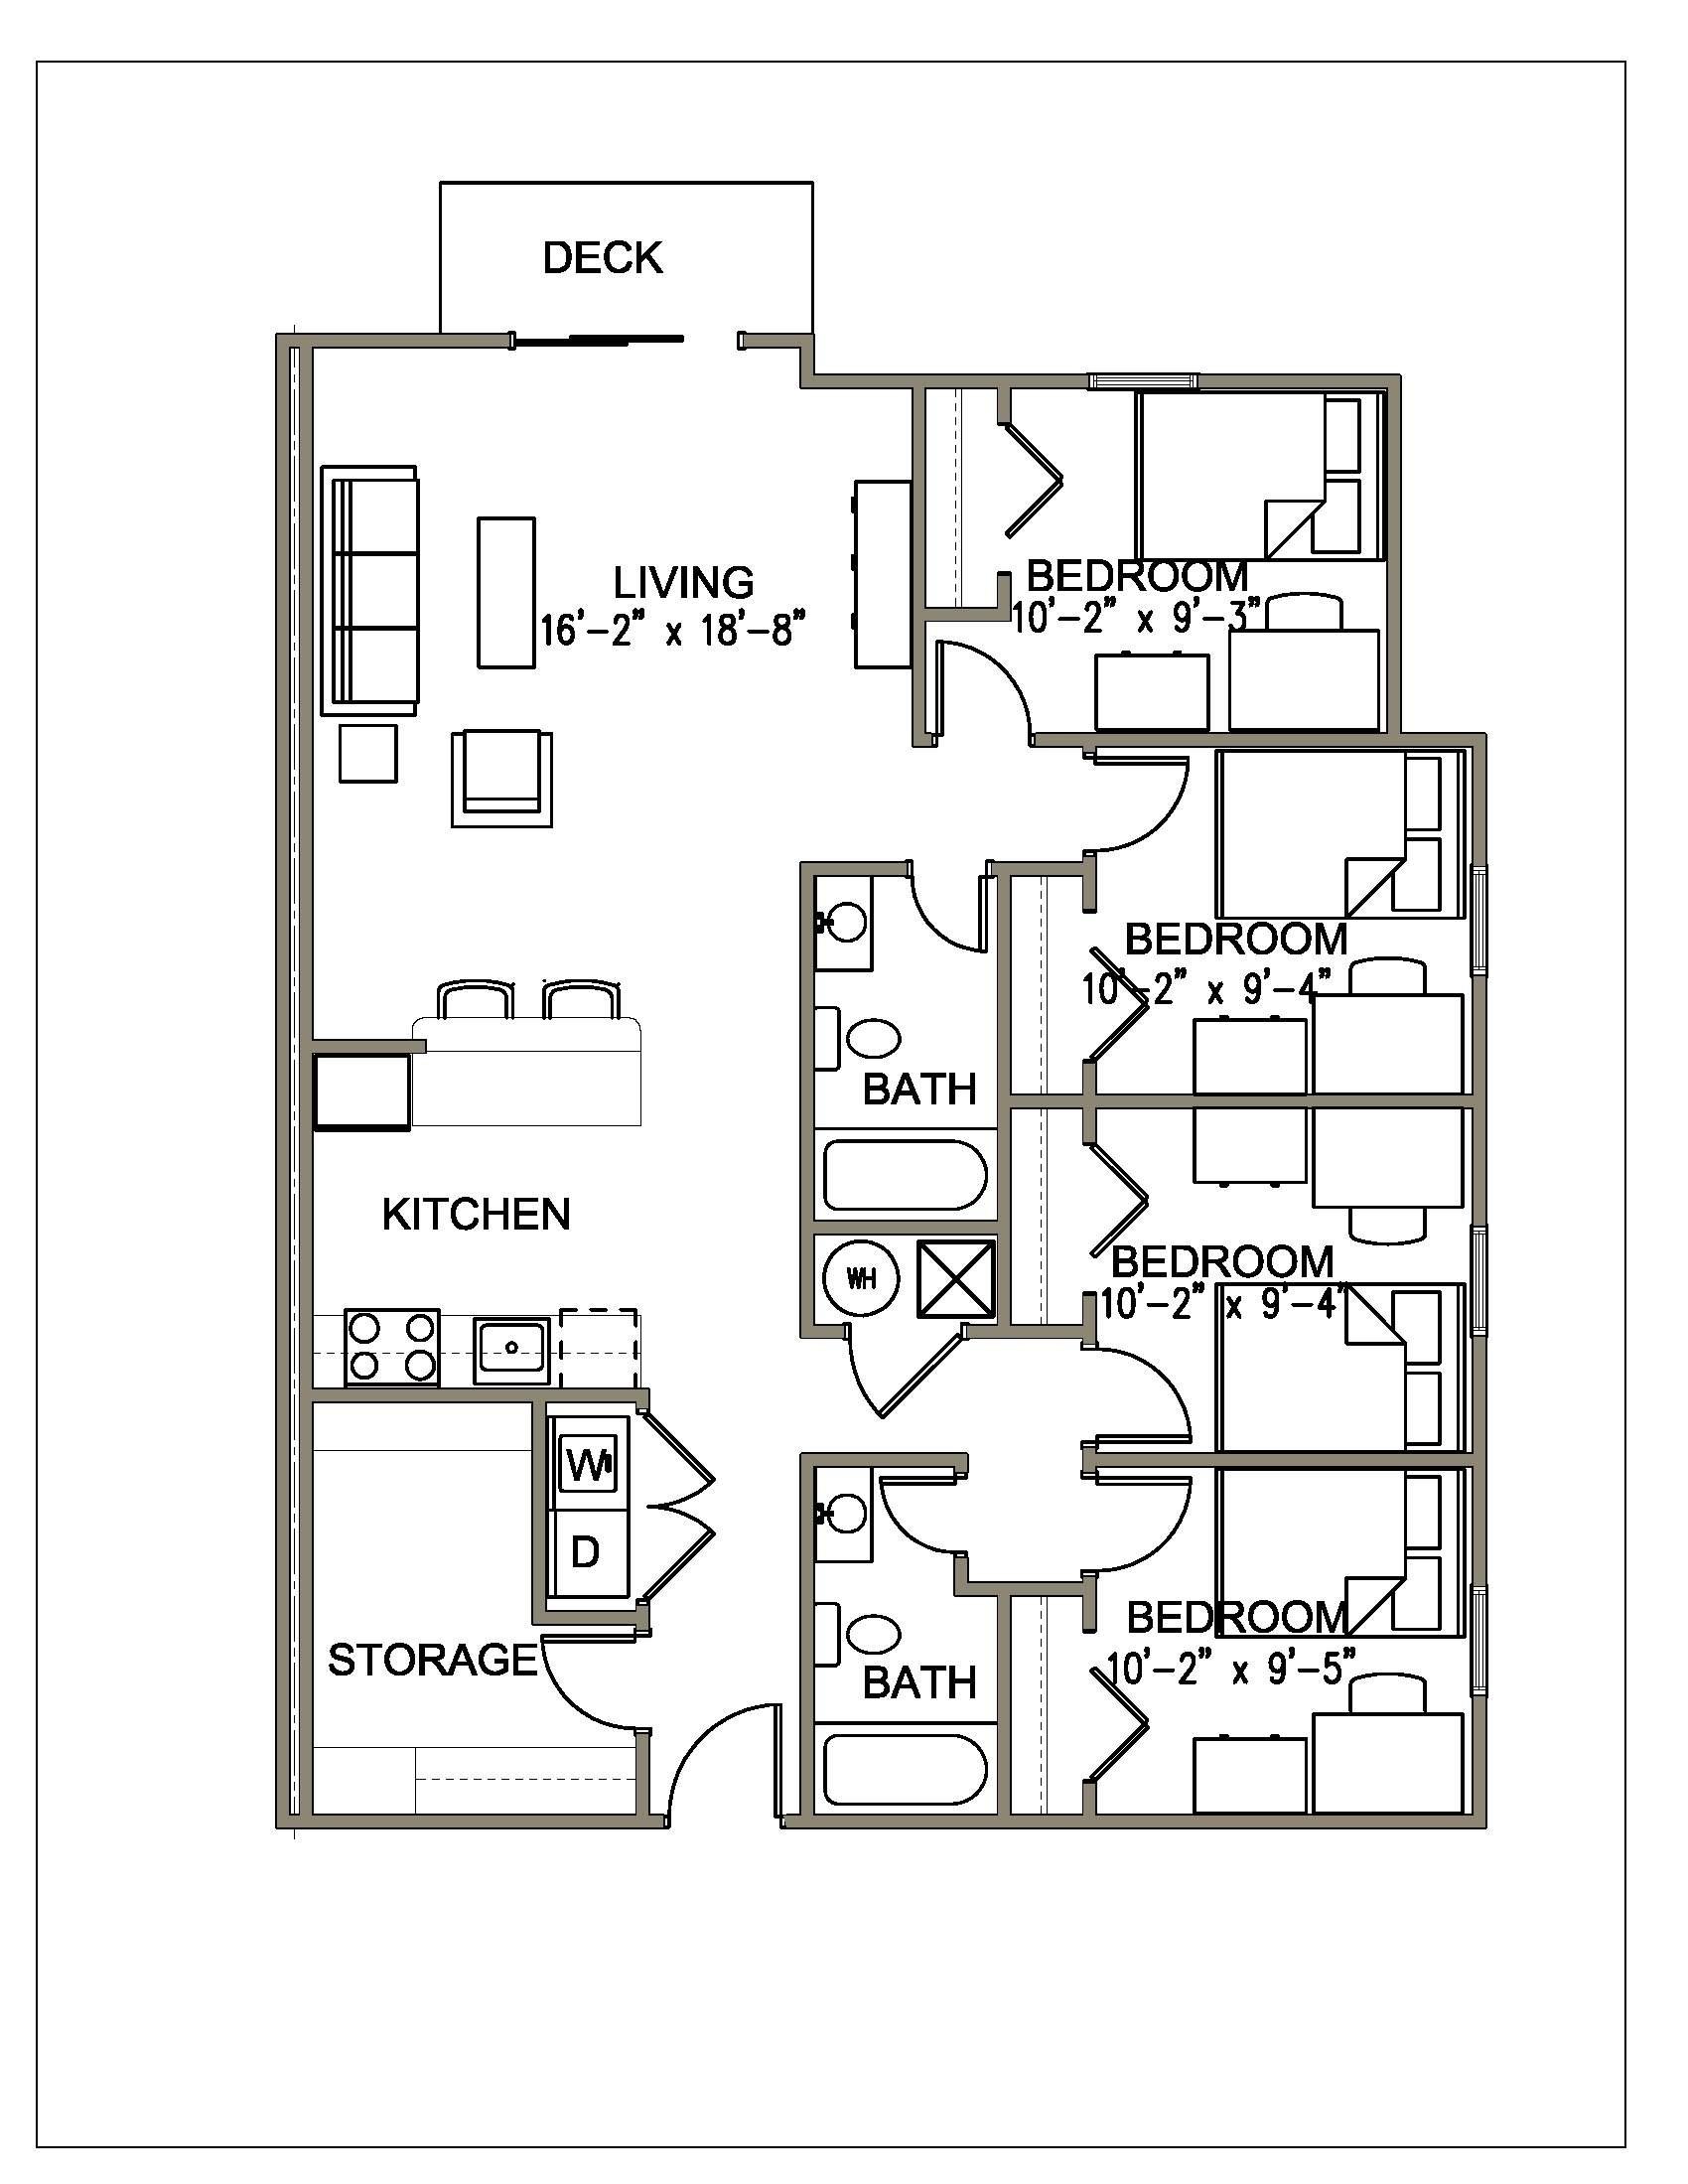 4 Bedroom 2 Bath Apartment Floor Plans Small House Interior Design